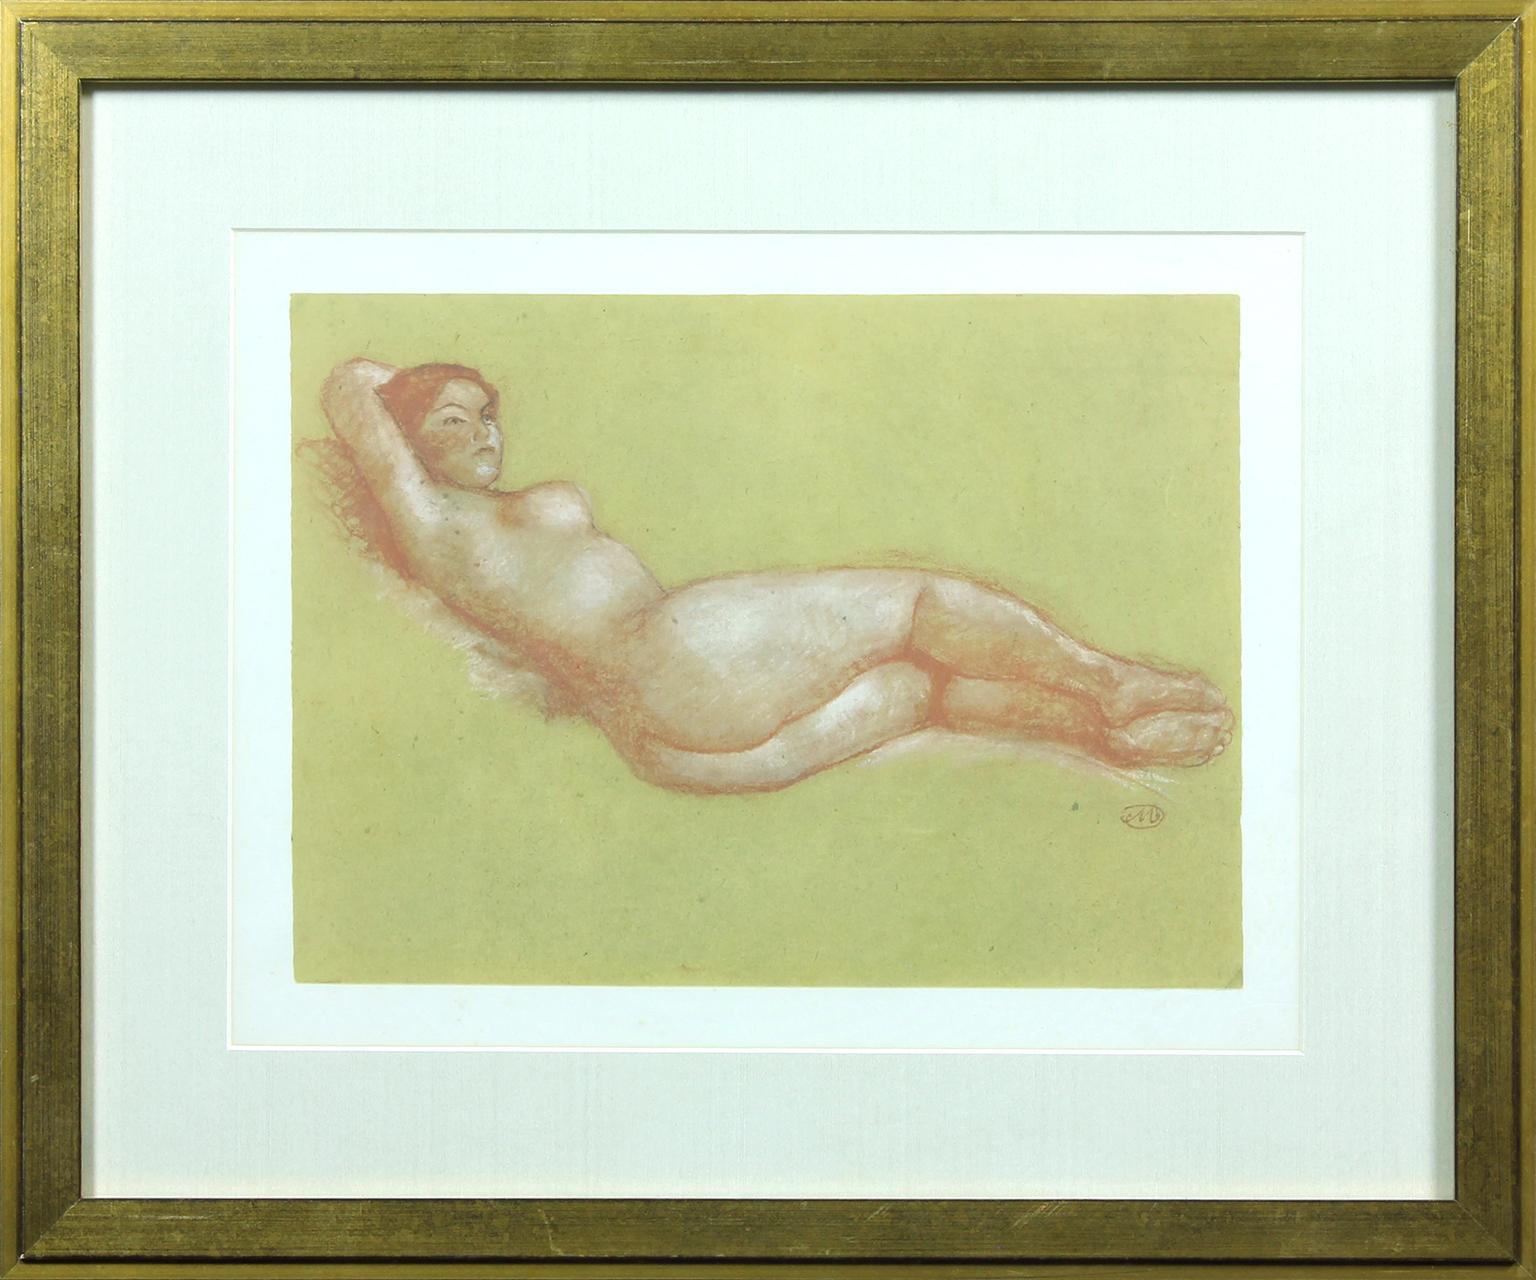 Untitled Aristide Maillol lithograph.